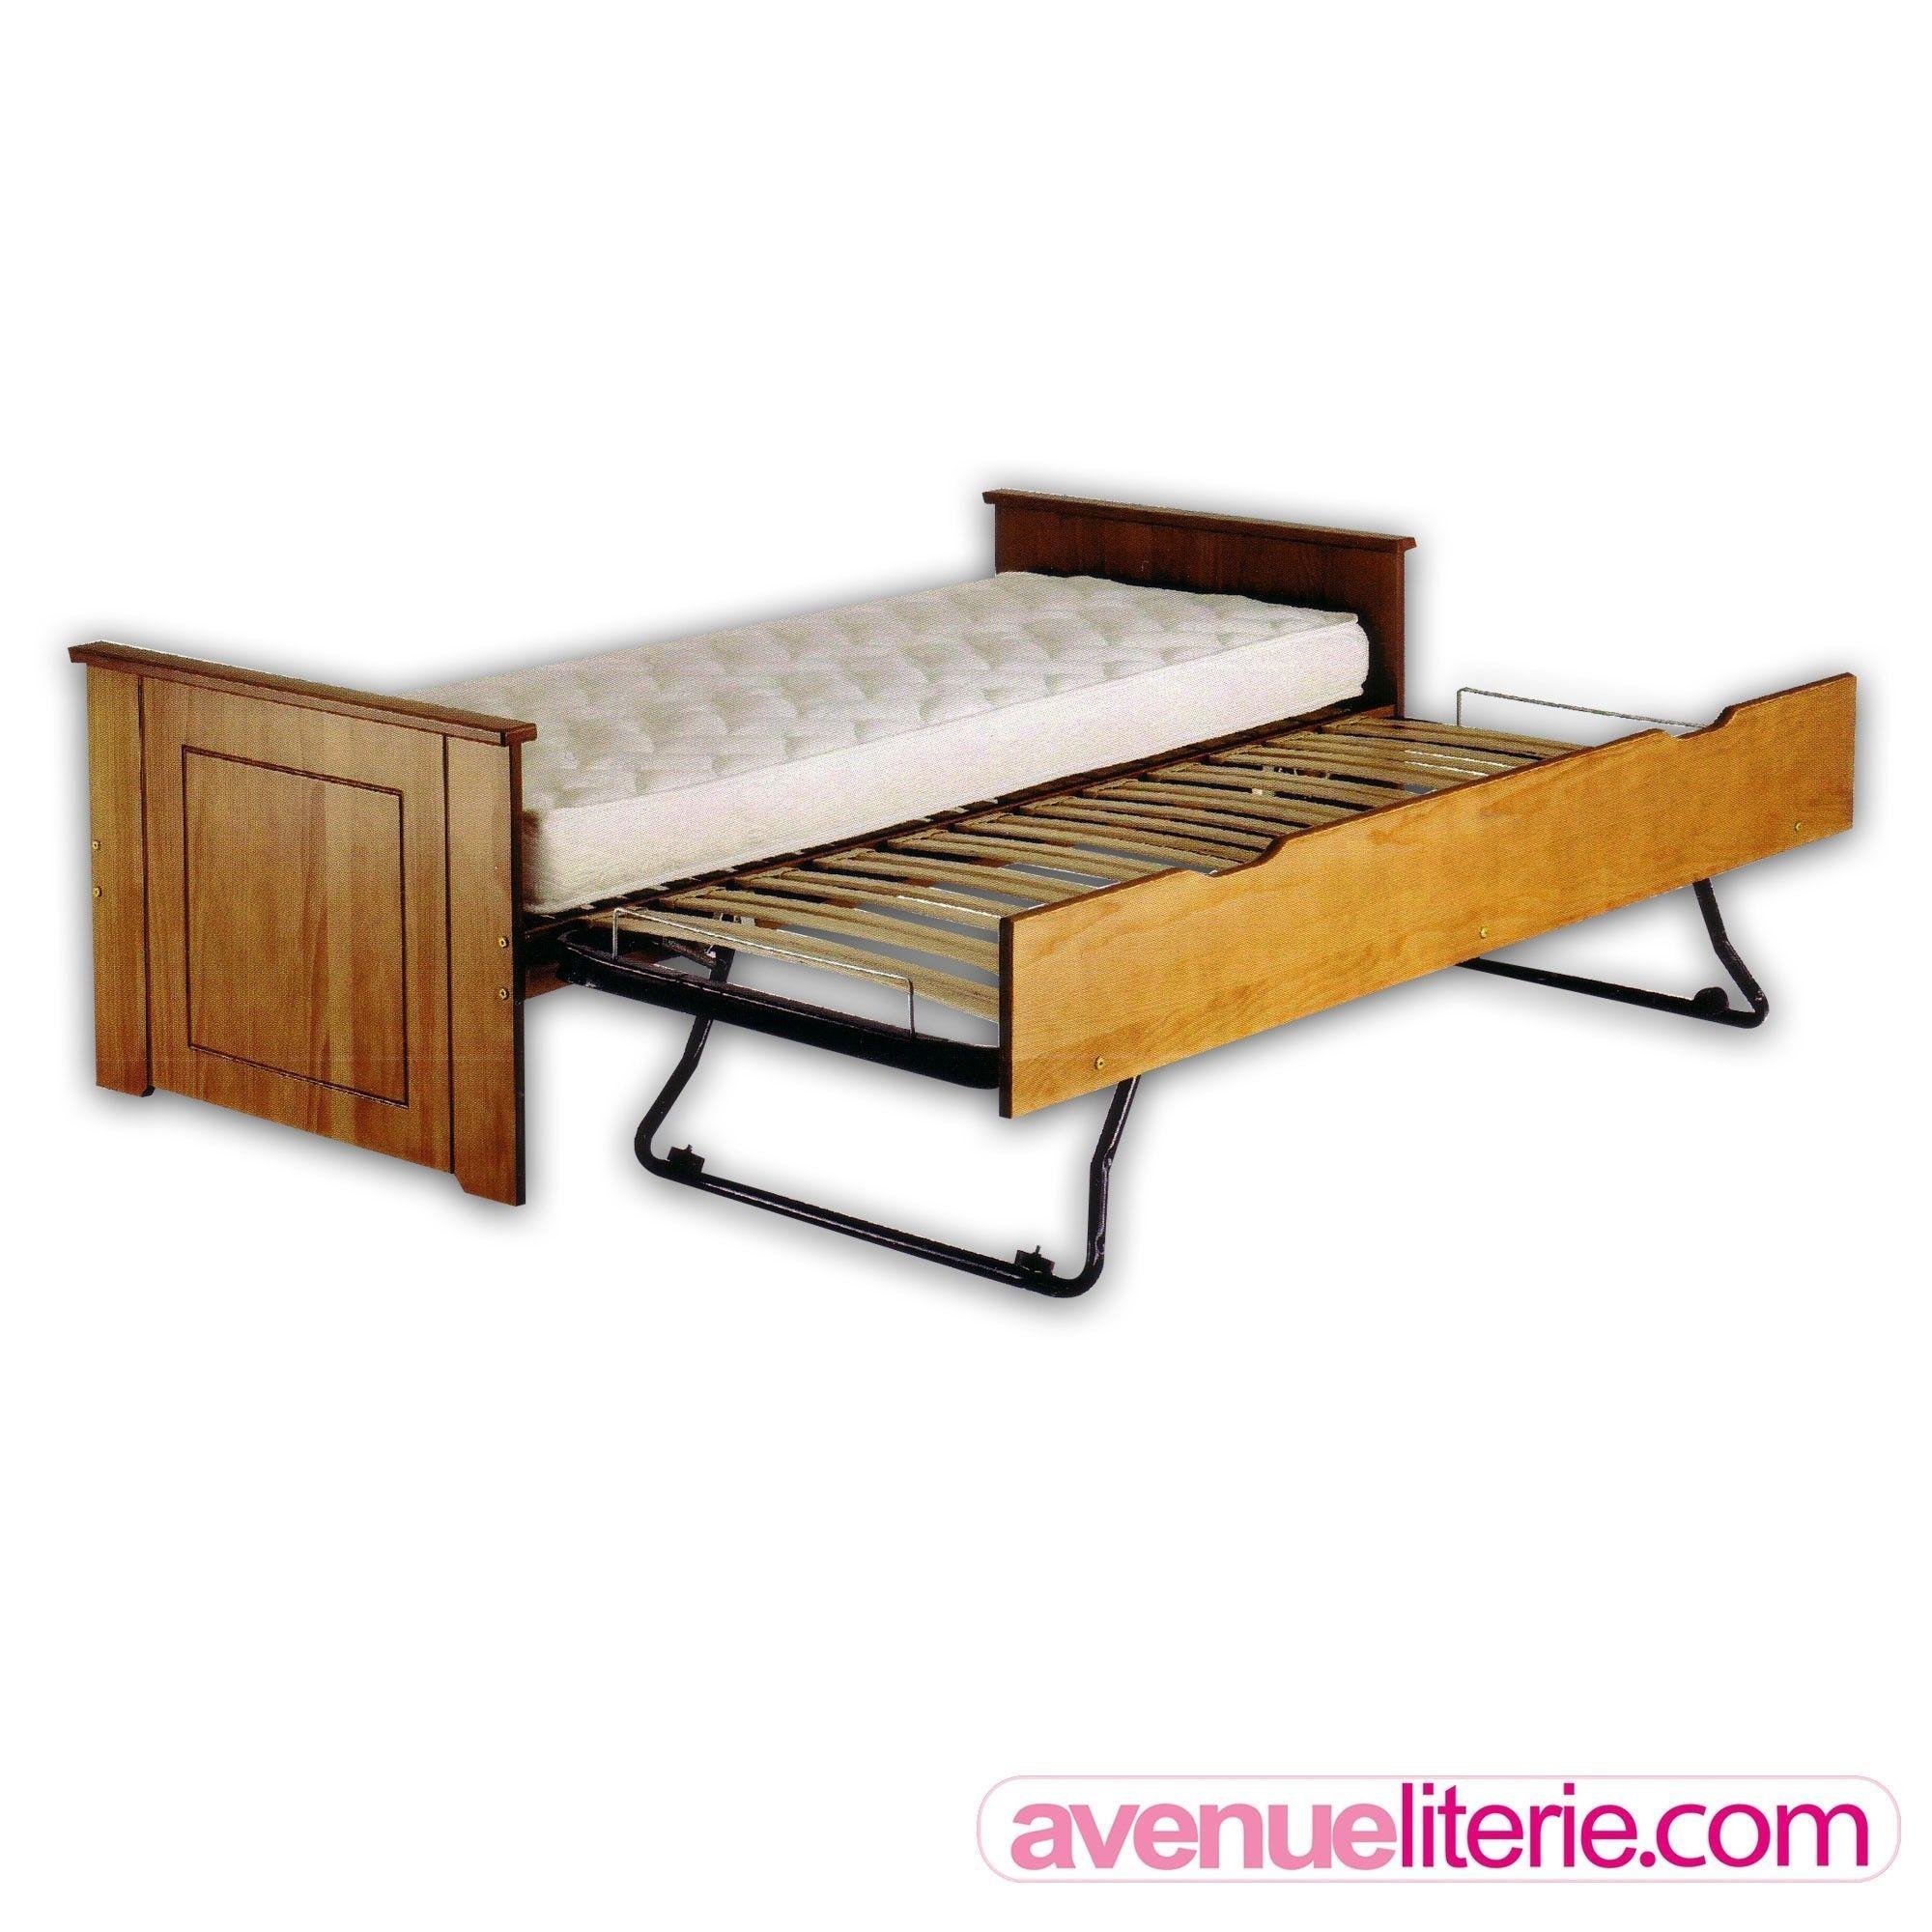 acheter lit gigogne bois pas cher avenue literie. Black Bedroom Furniture Sets. Home Design Ideas